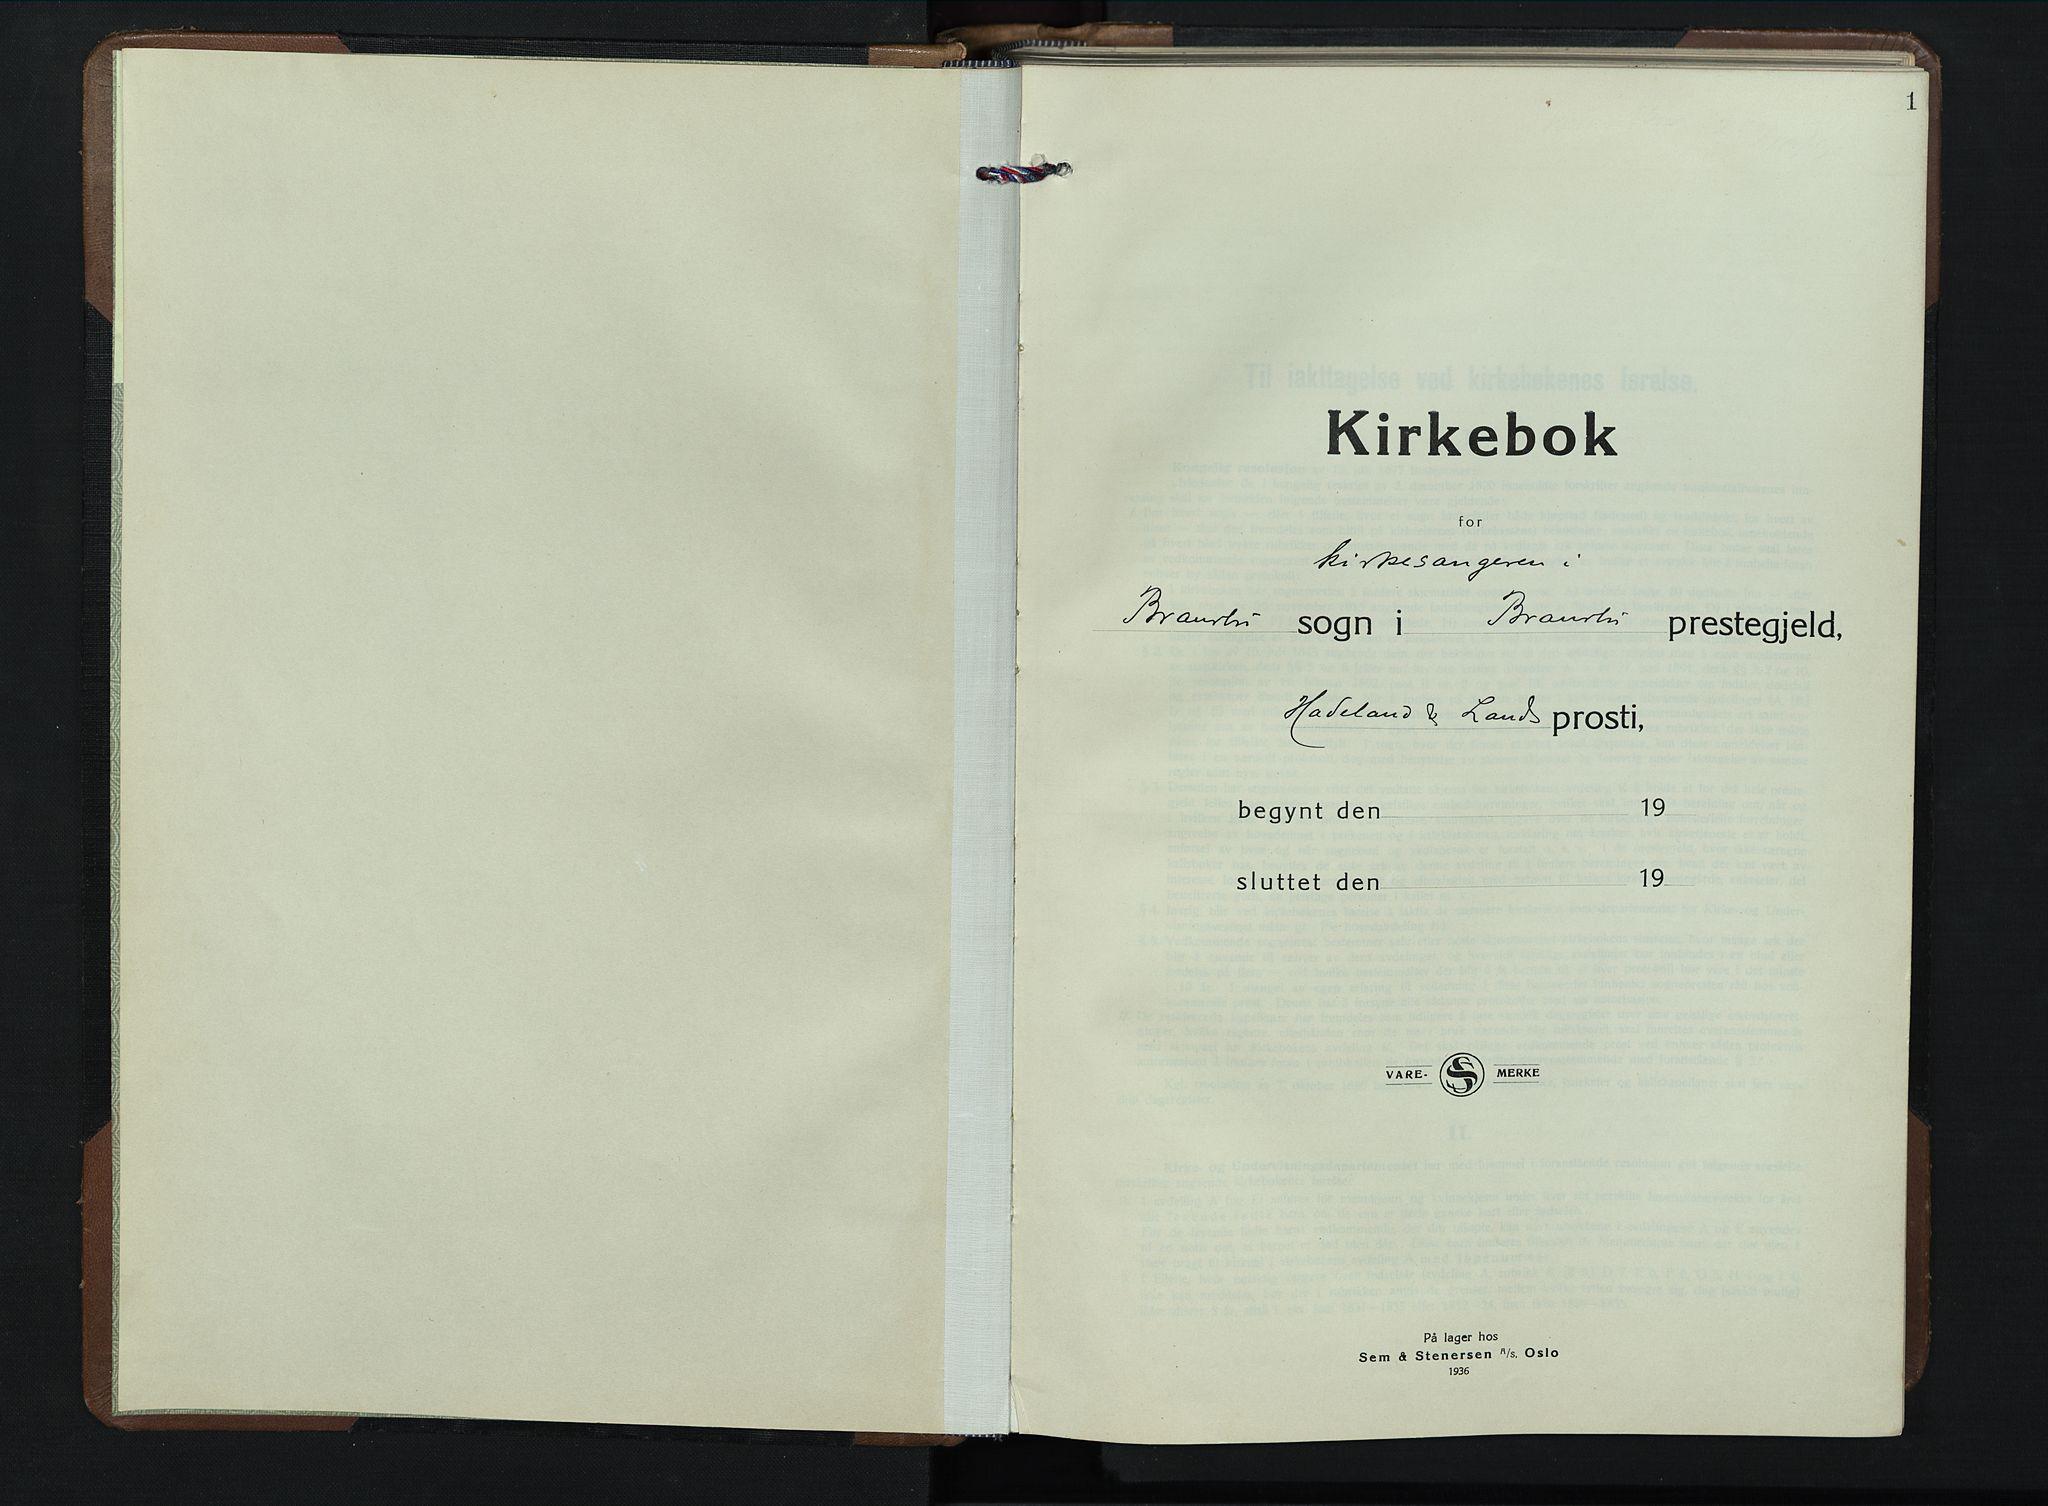 SAH, Brandbu prestekontor, Klokkerbok nr. 2, 1937-1953, s. 1